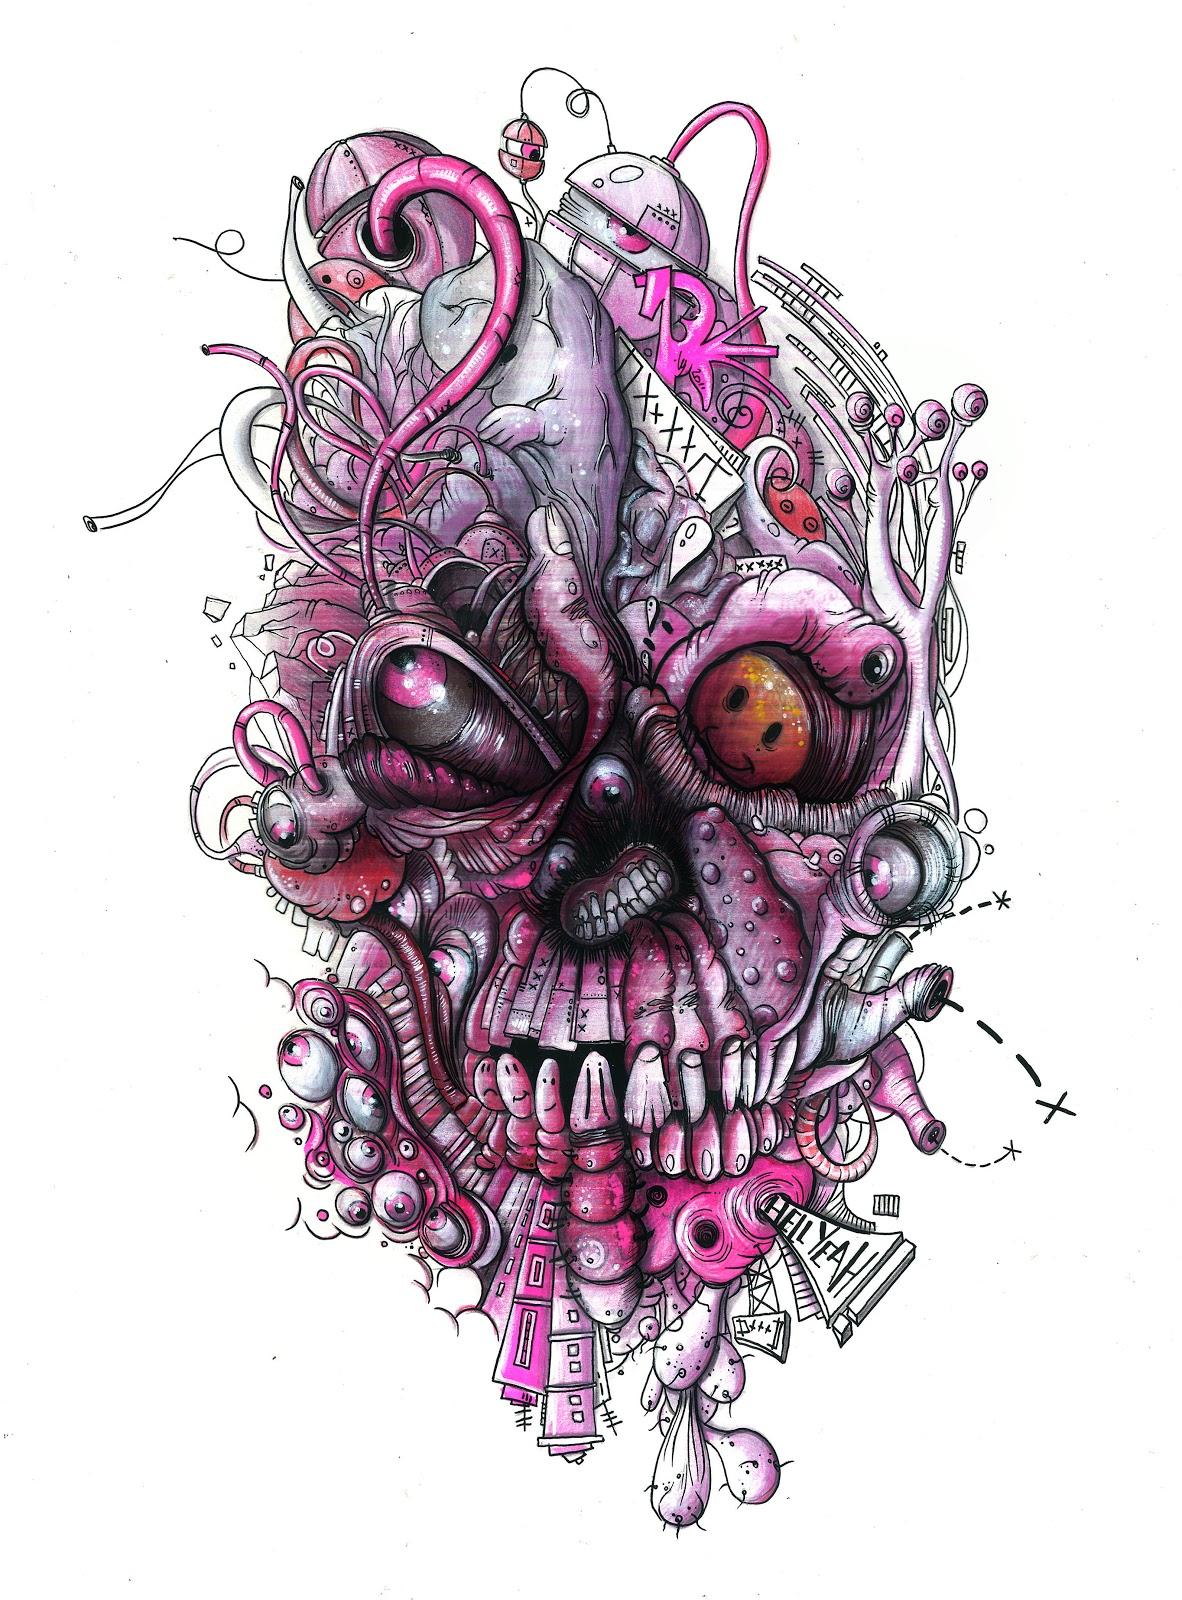 http://2.bp.blogspot.com/-7v5xdExXswY/ThMWvLa4NDI/AAAAAAAAARw/wW6Y1z5Hnhw/s1600/313+FUCKING+SKULL+HEAD.jpg